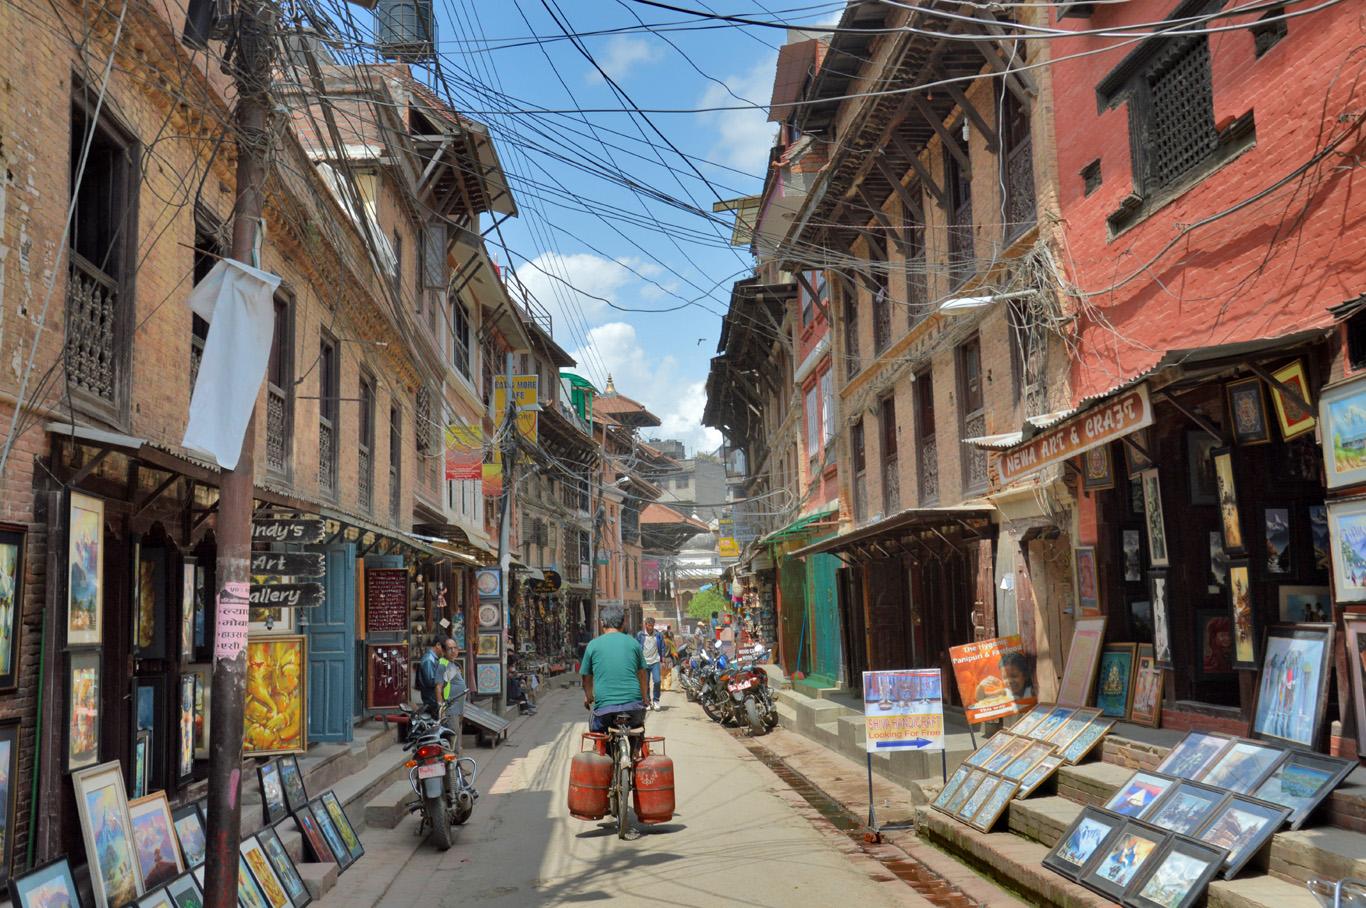 How to Get Around Kathmandu - Full of Contrast, Fascinating Capital Kathmandu City Street Map on windhoek city street map, shanghai city street map, juba city street map, chicago city street map, munich city street map, jerusalem city street map, montevideo city street map, phoenix city street map, athens city street map, kowloon city street map, kigali city street map, hobart city street map,